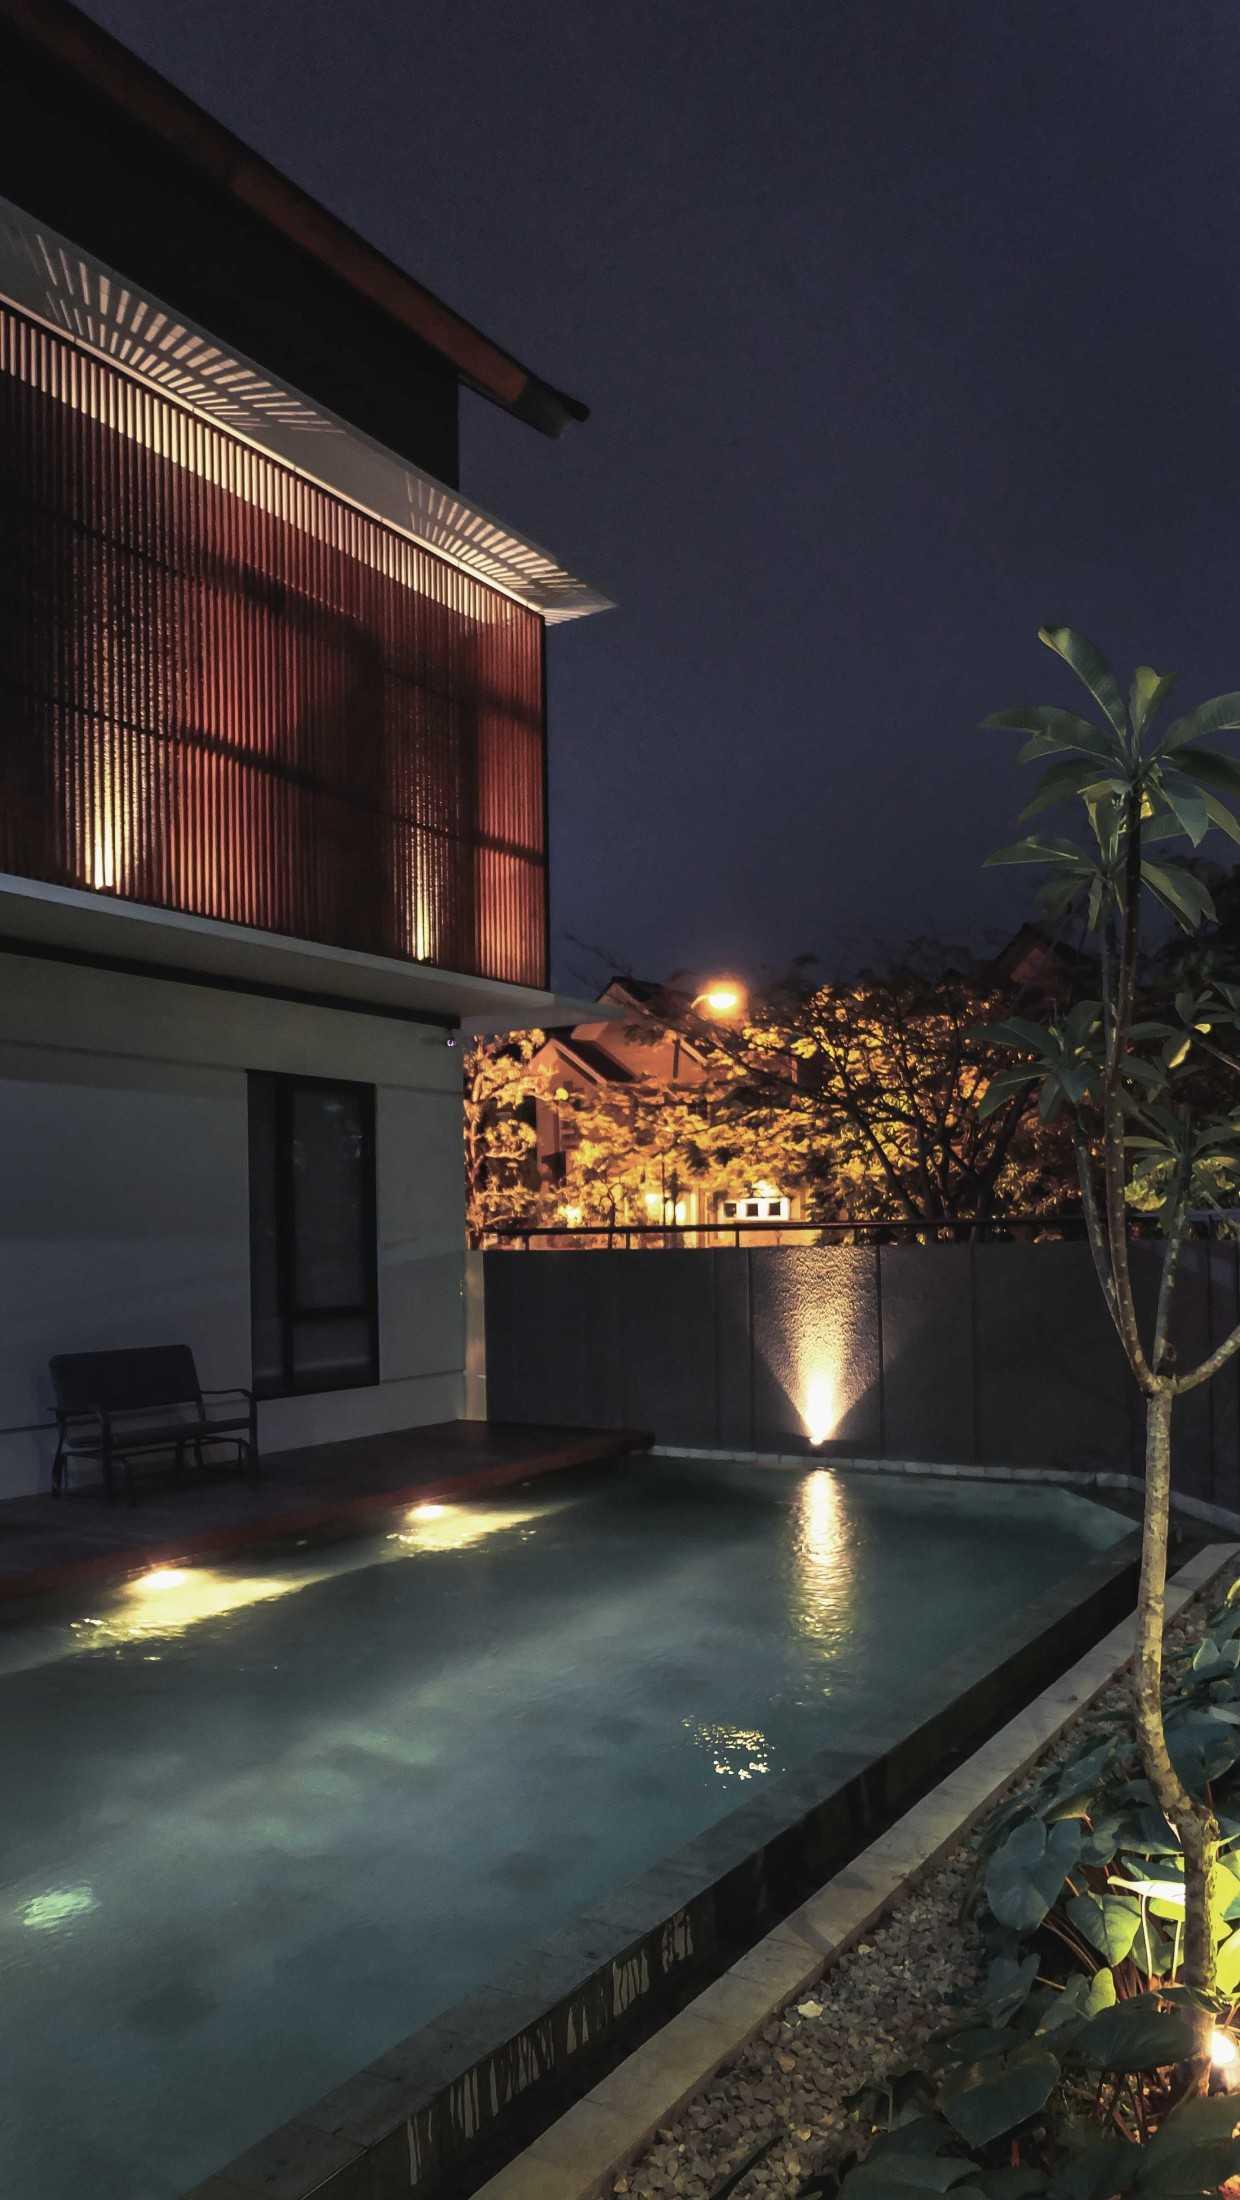 Gohte Architects Vk Homes Lippo Karawaci, Binong, Kec. Curug, Tangerang, Banten, Indonesia Lippo Karawaci, Binong, Kec. Curug, Tangerang, Banten, Indonesia Gohte-Architects-Vk-Homes  96616